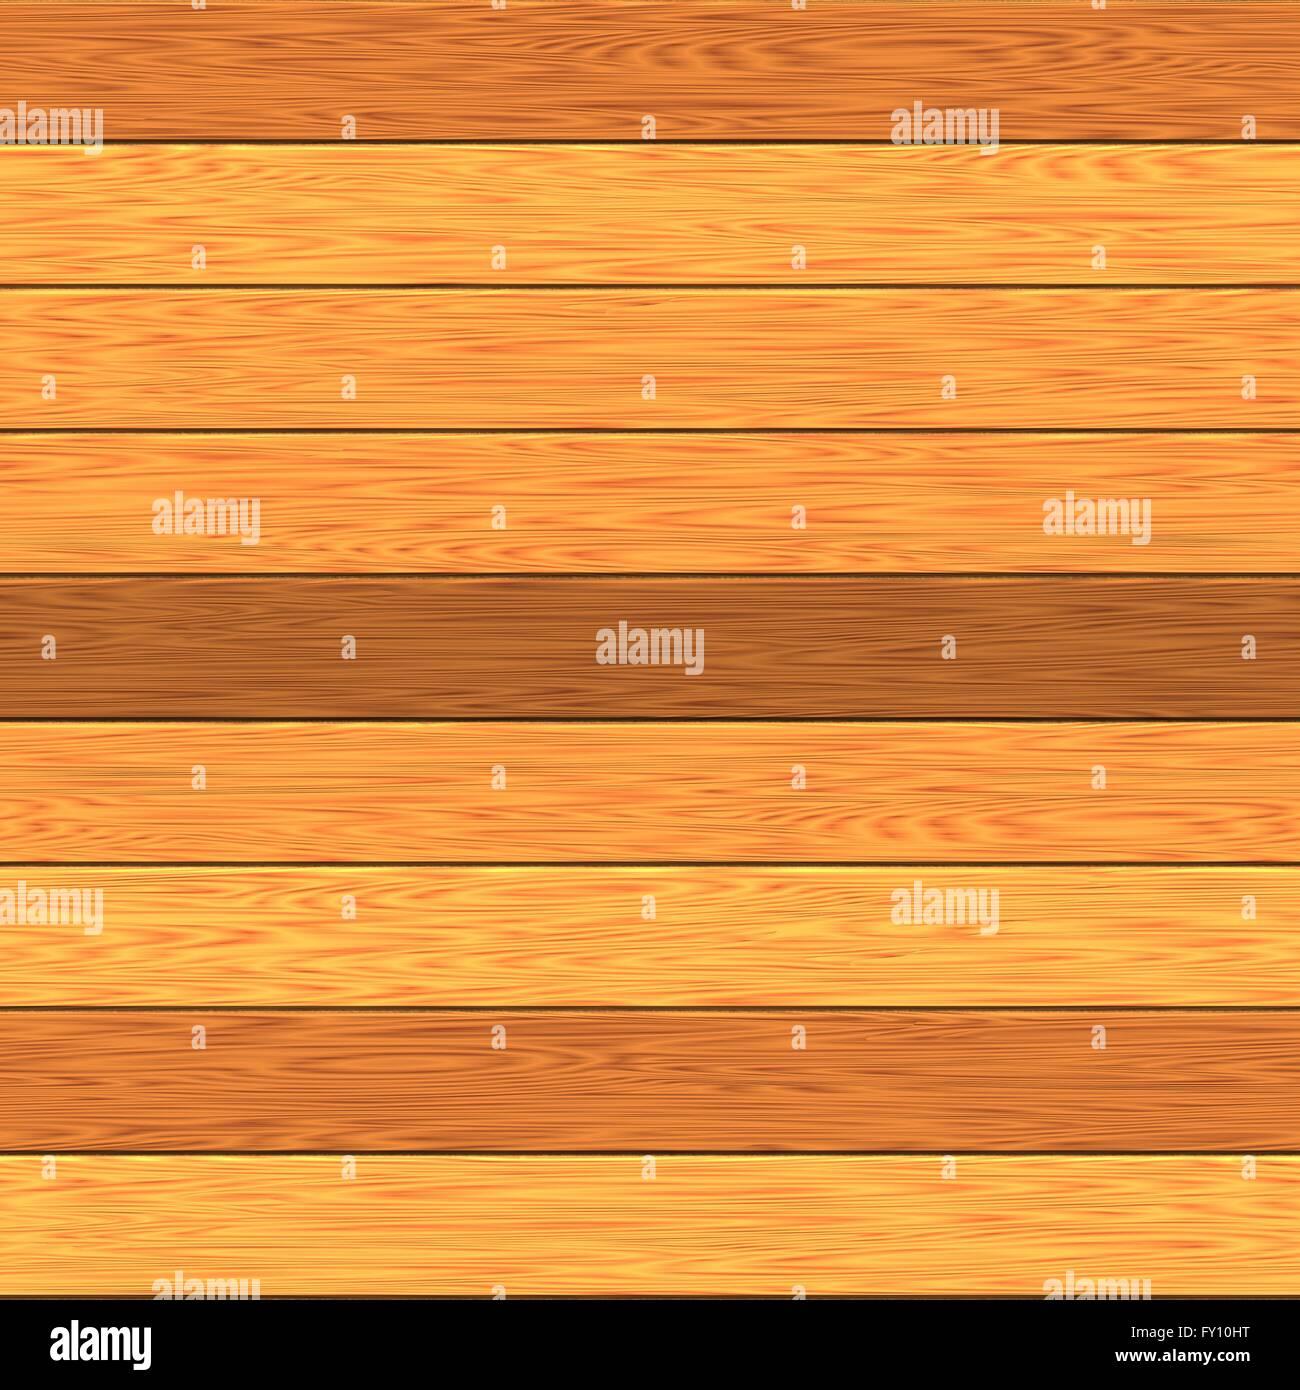 Seamless texture wooden parquet laminate flooring stock photo seamless texture wooden parquet laminate flooring doublecrazyfo Images